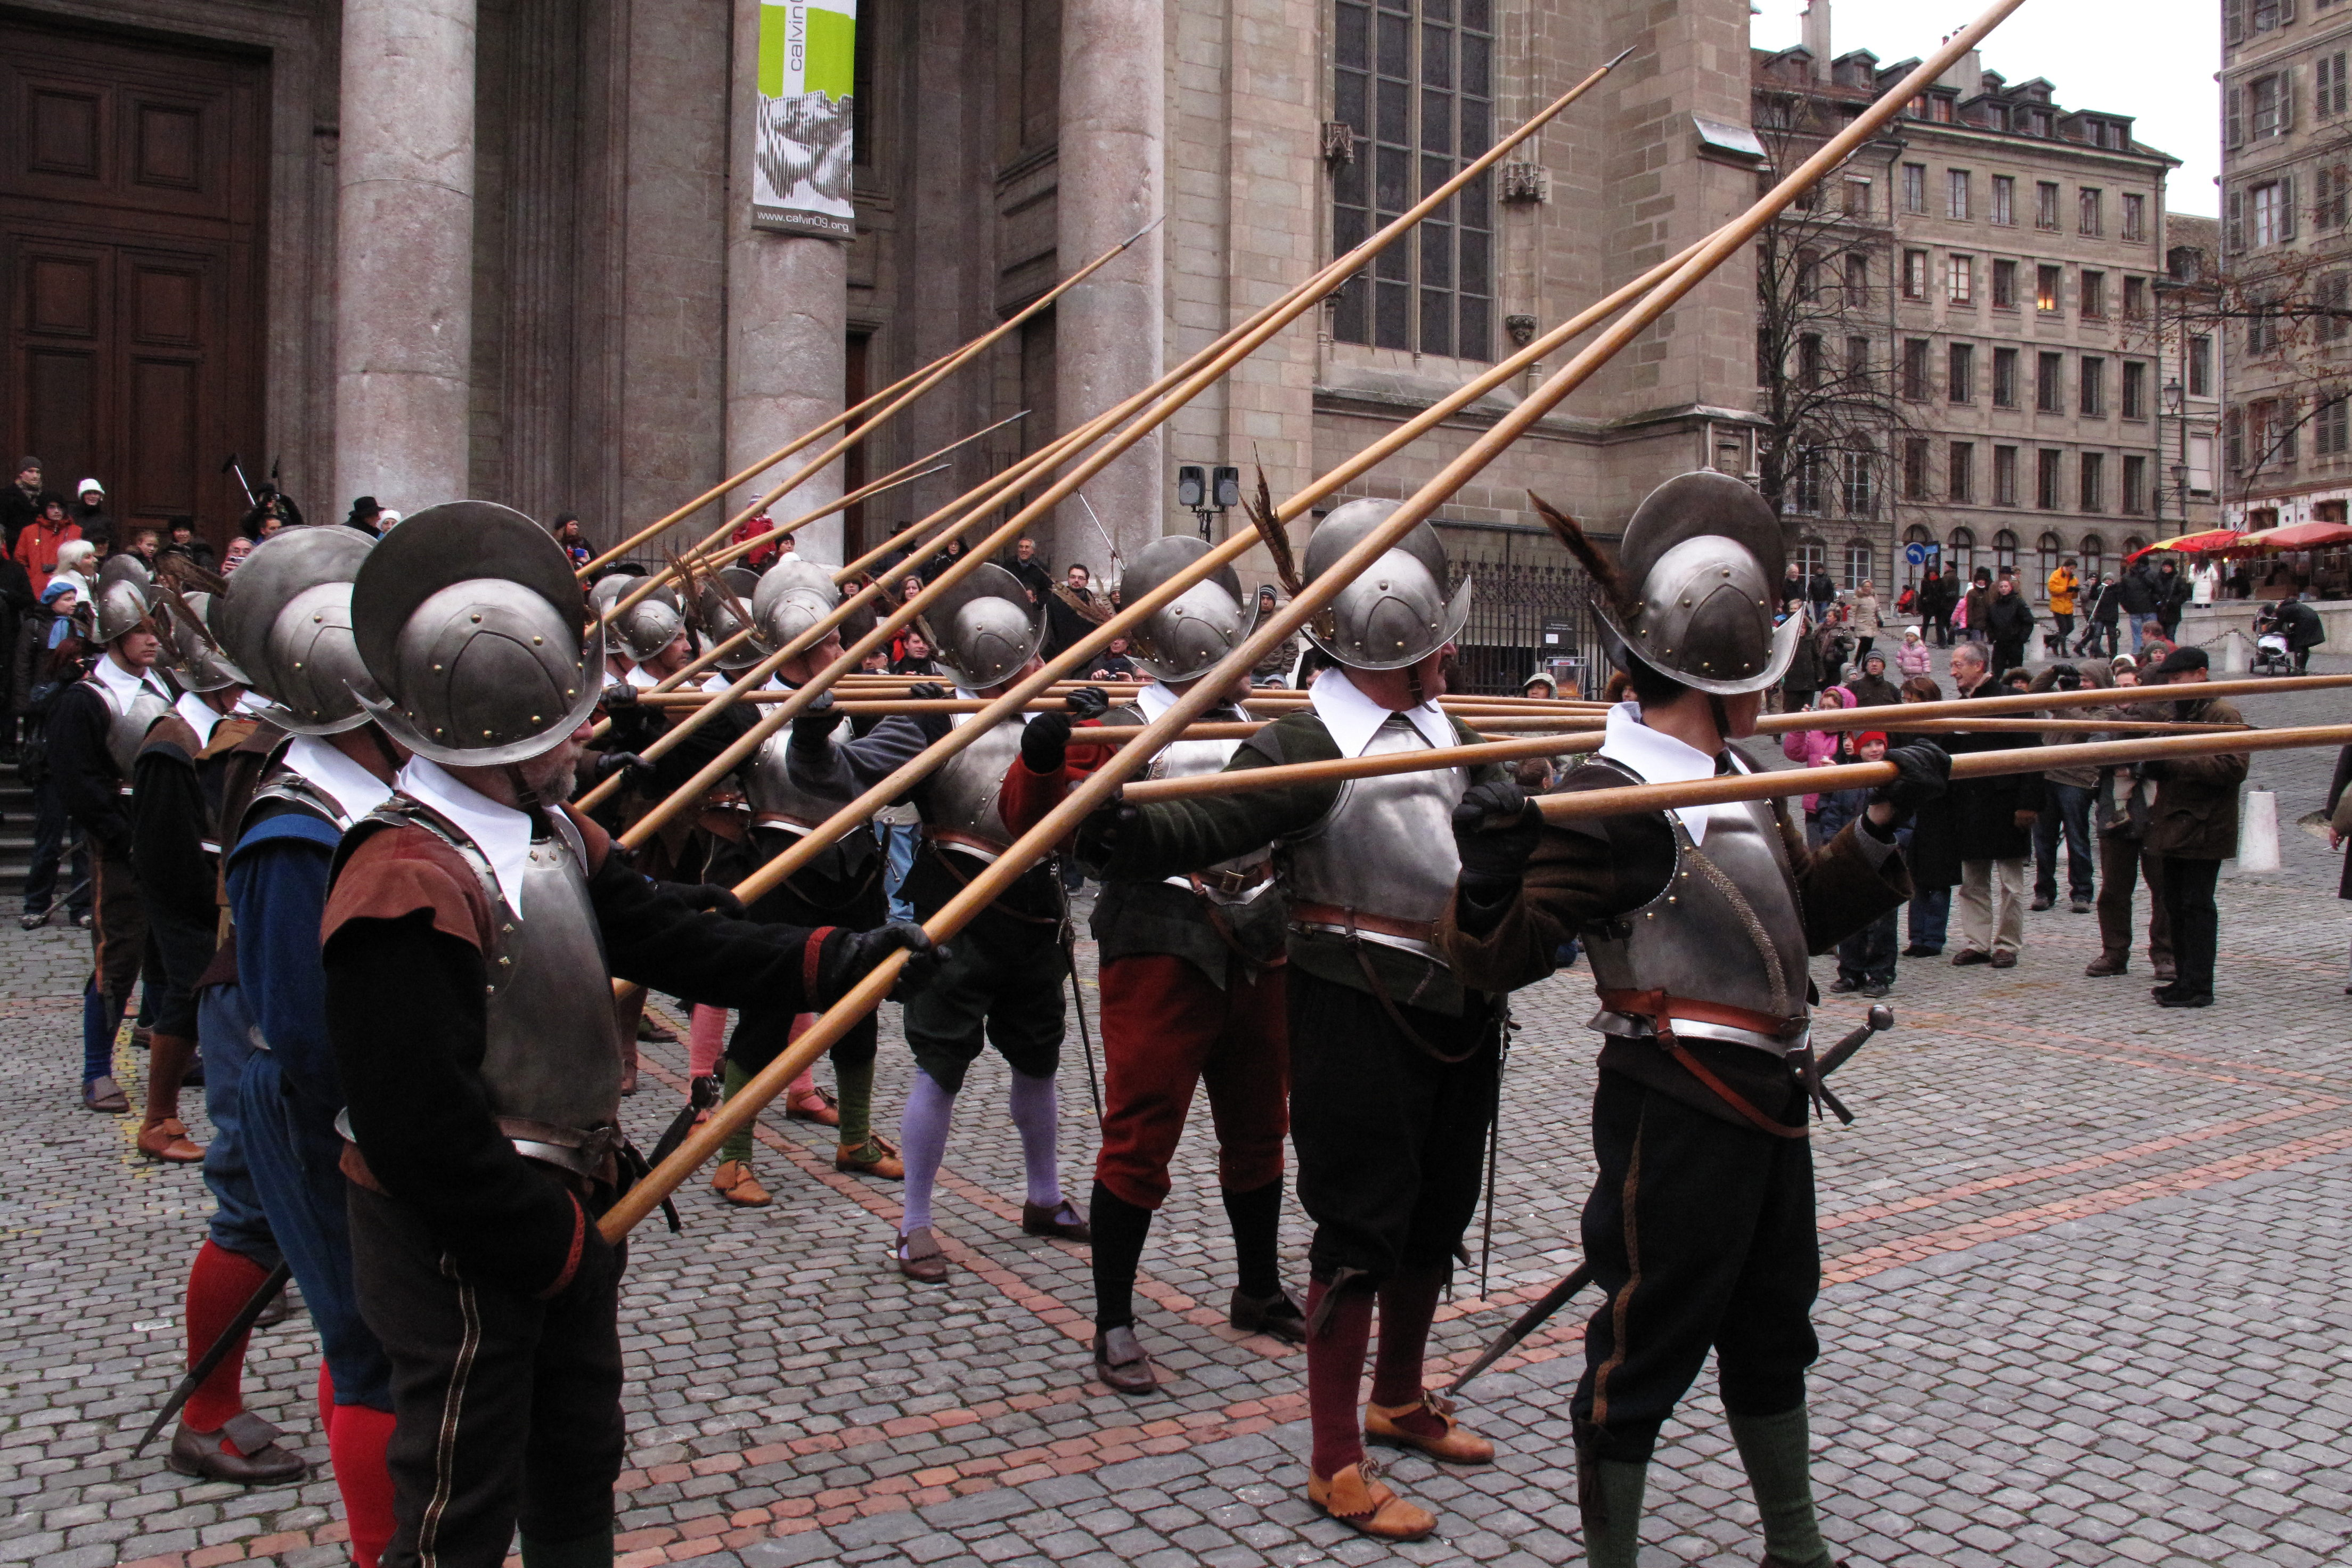 spear square